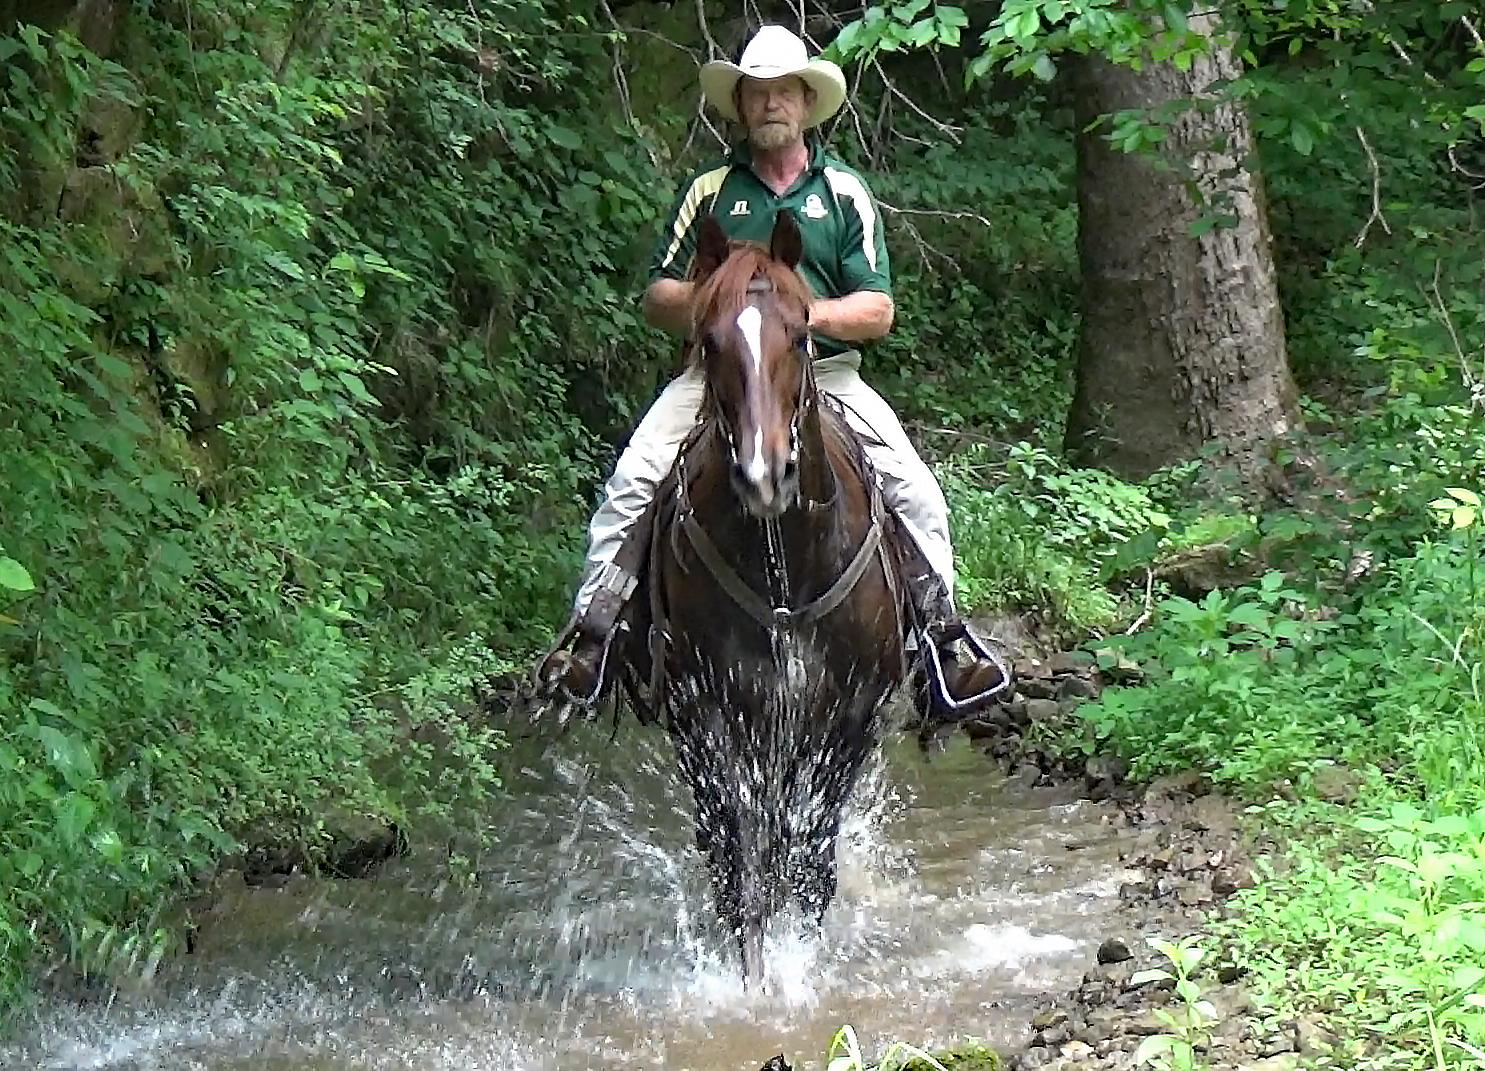 Hidalgo on trails.Movie_SnapshotA.jpg